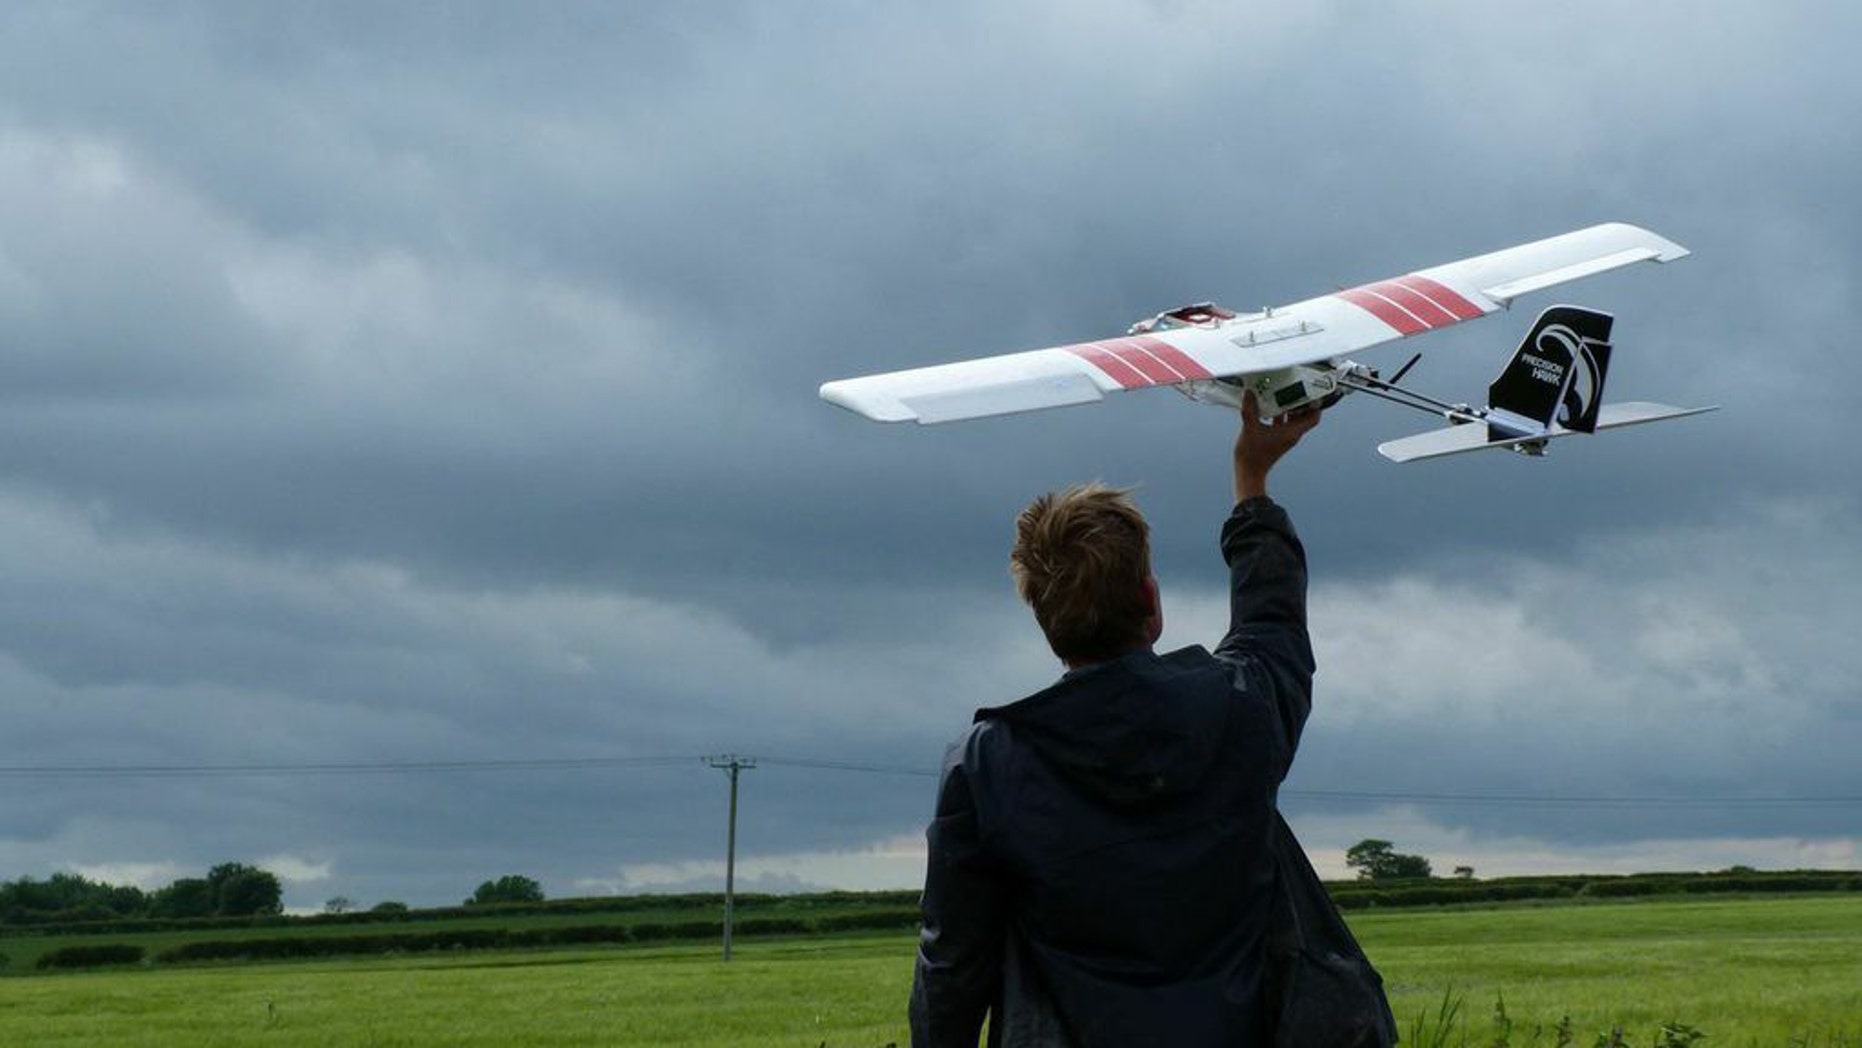 The PrecisionHawk surveillance drone